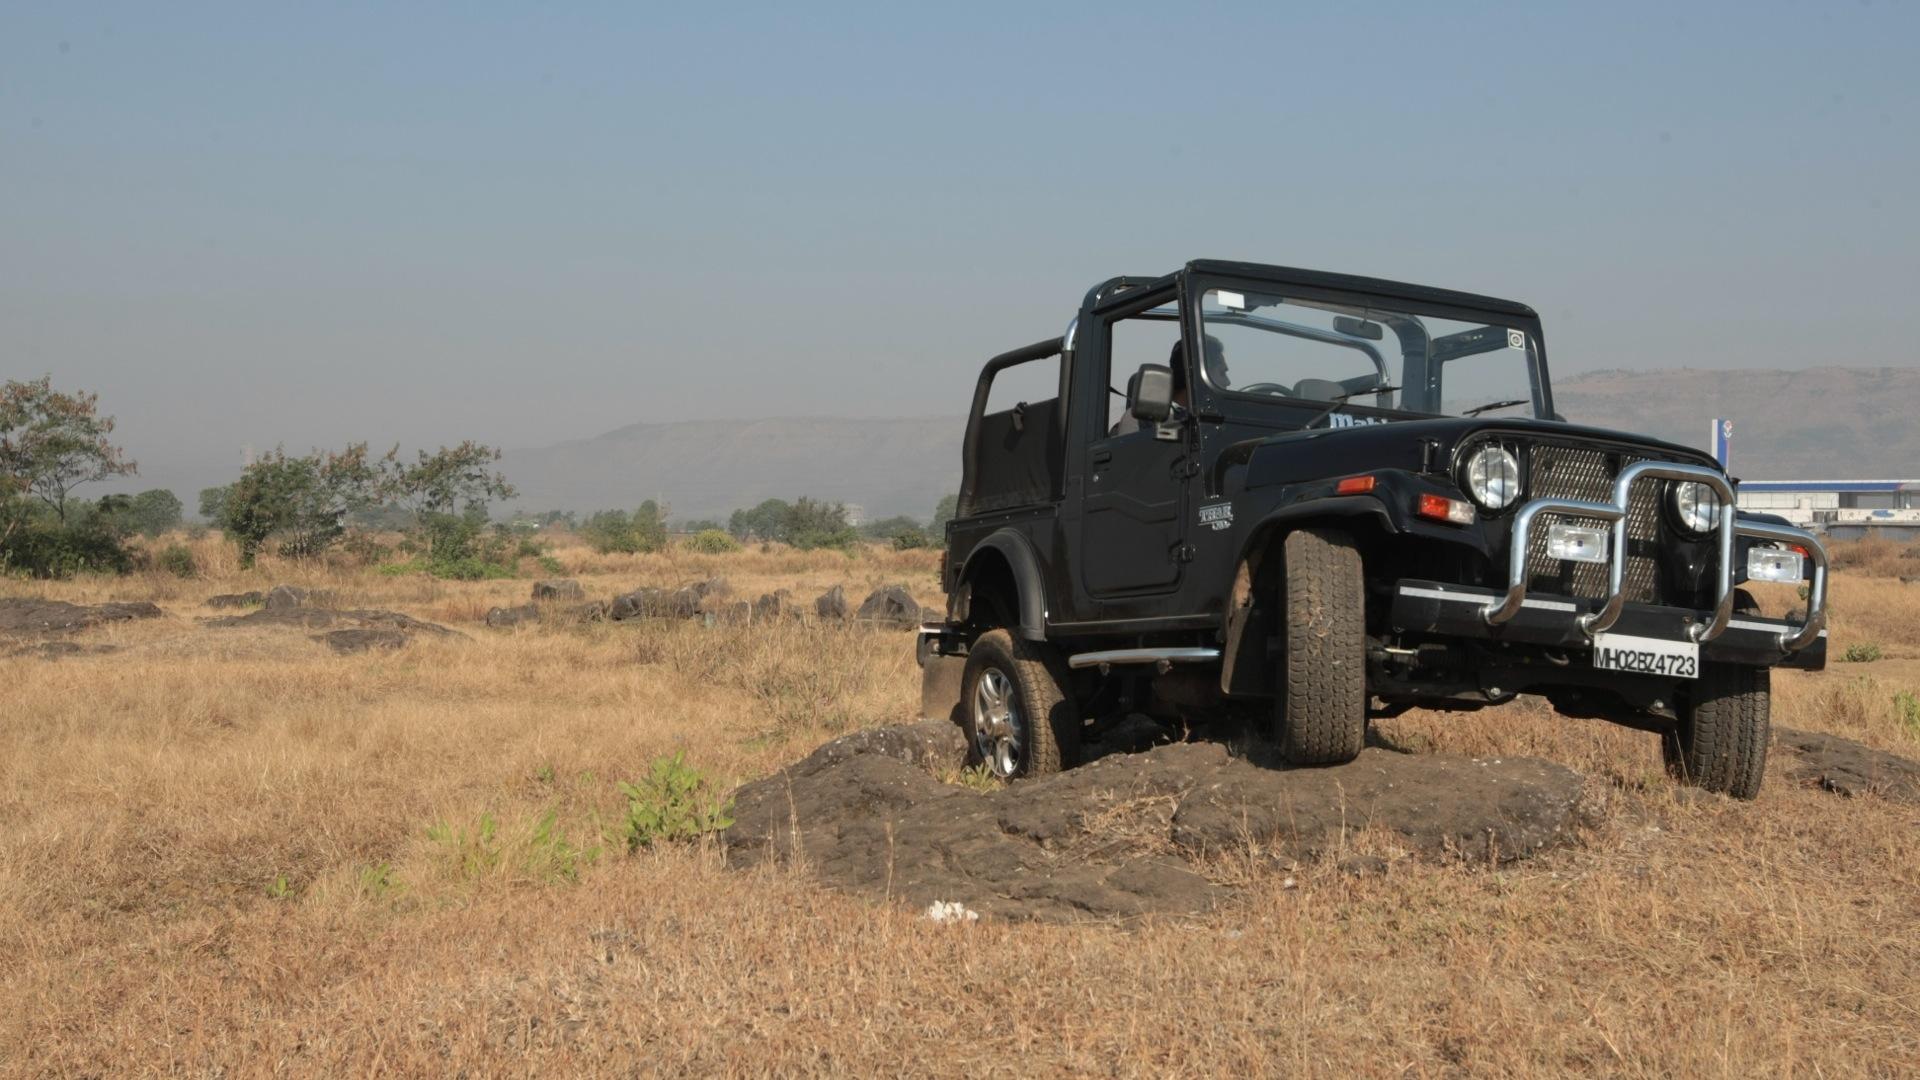 Mahindra-Thar-2013-CRDe--4x4-Exterior